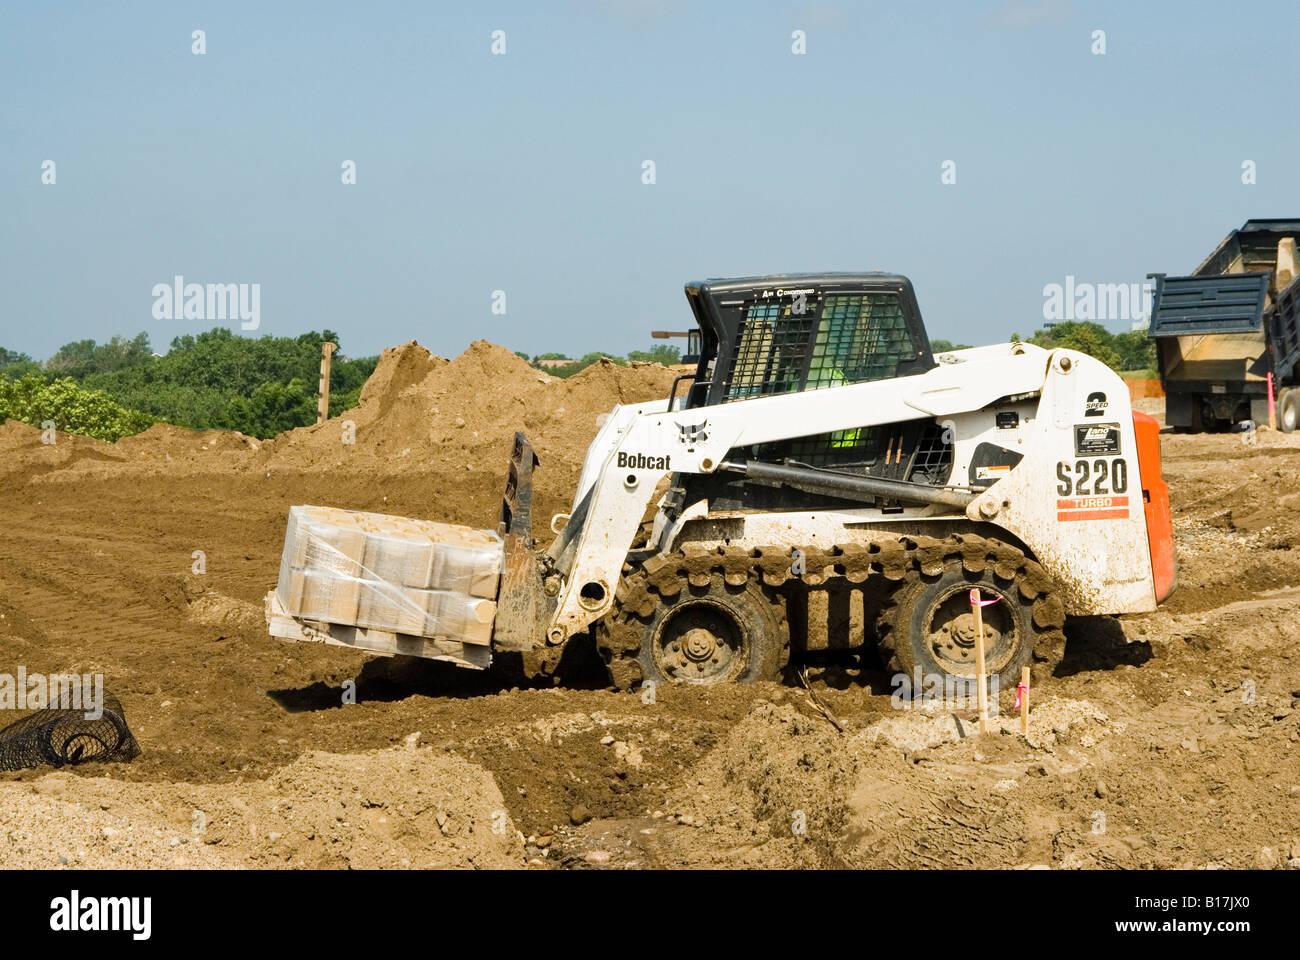 a bobcat skid loader at work on a consturction site Stock